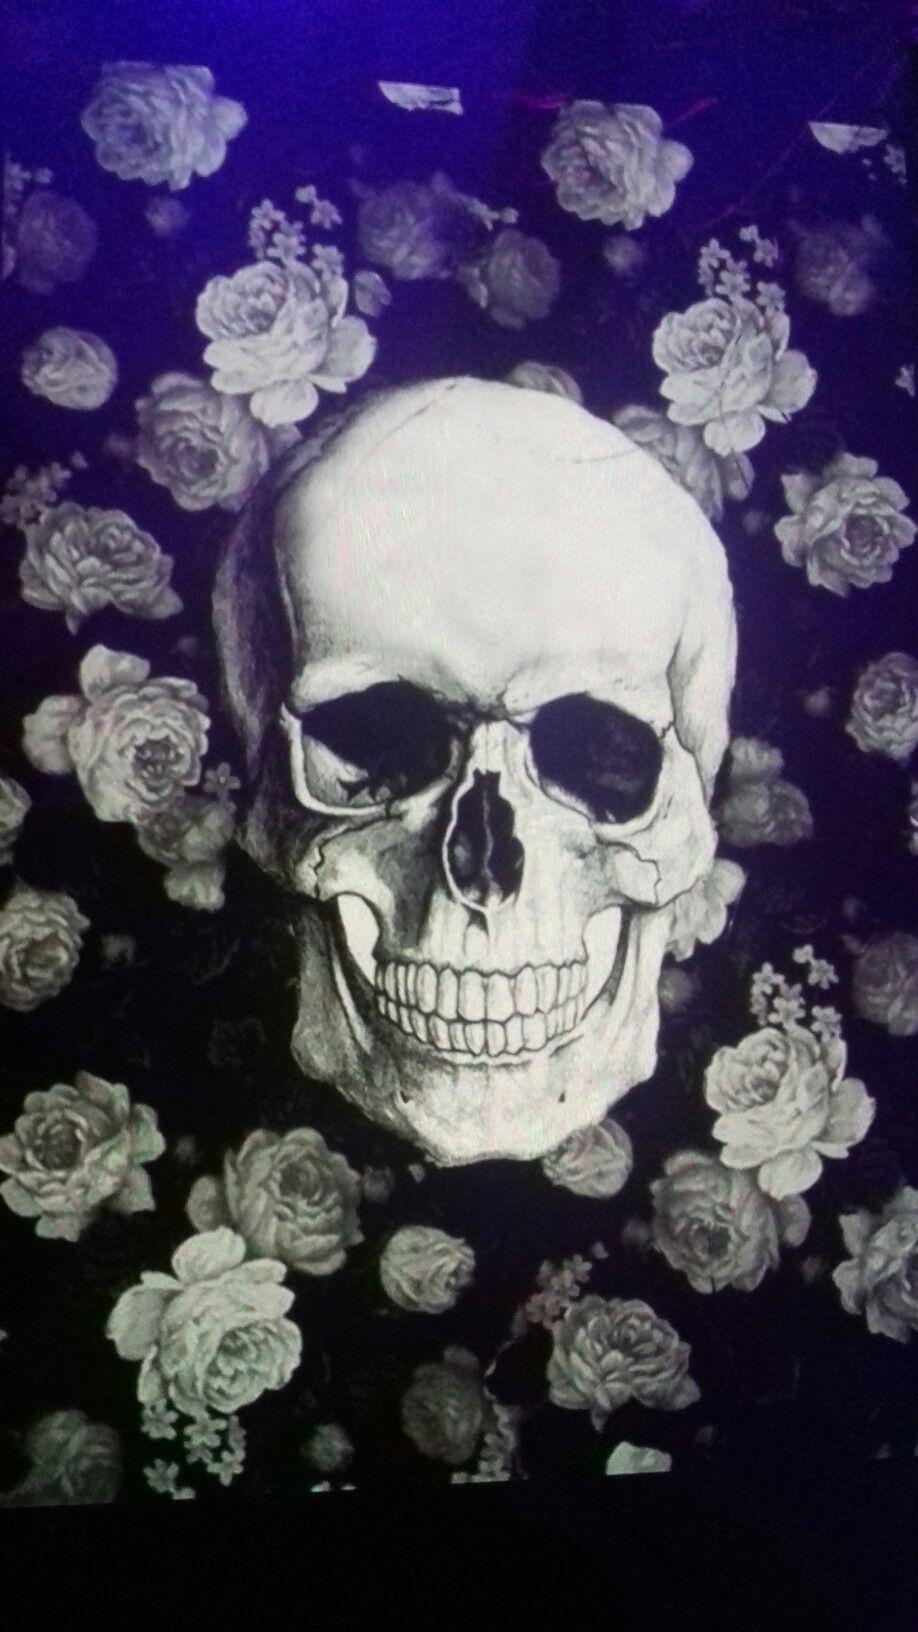 Pin by Jaclyn835 David on Flowers Skull wallpaper, Skull